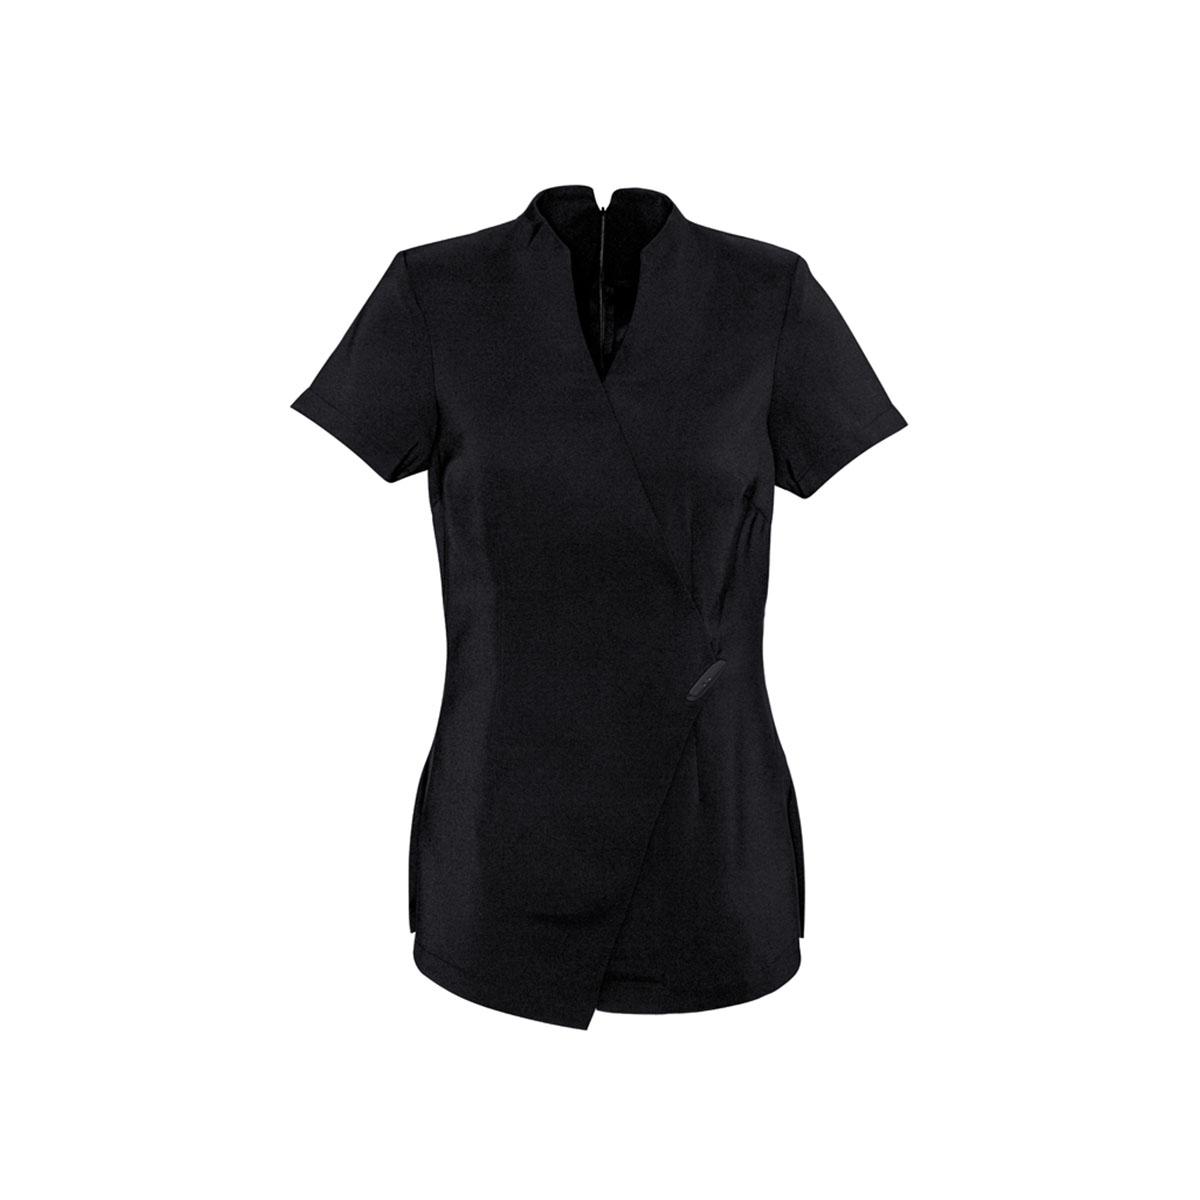 Ladies Spa Tunic-Black / Black